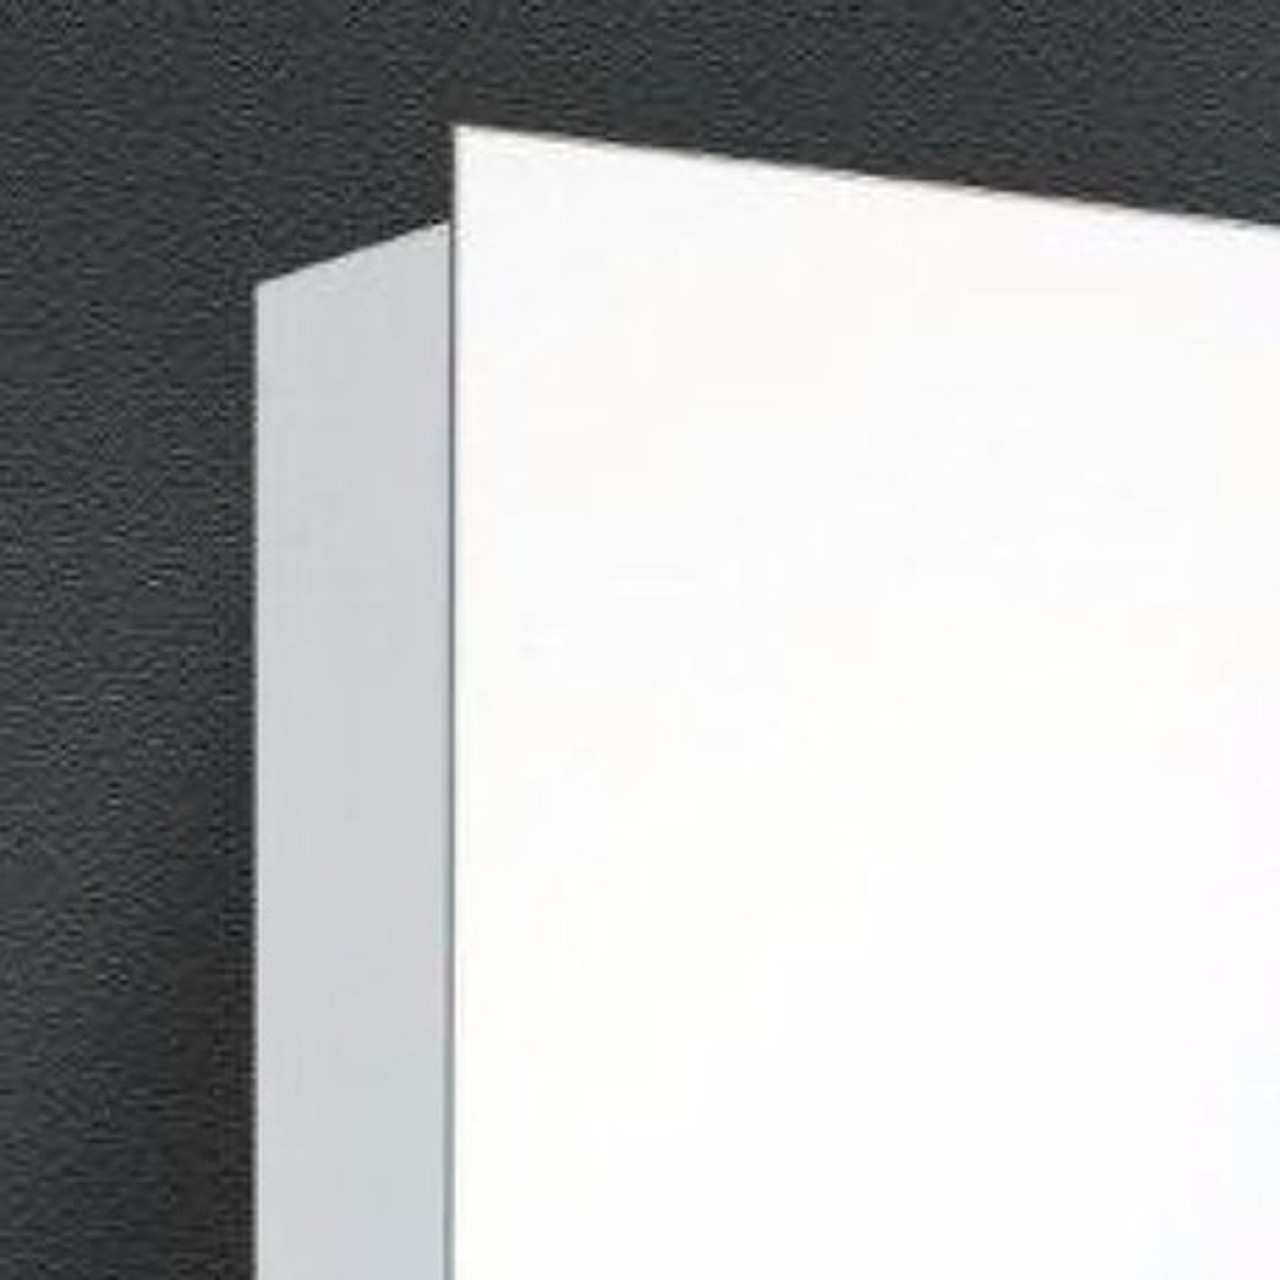 Ketcham Corner Medicine Cabinets Stainless Steel Series - Tri-View